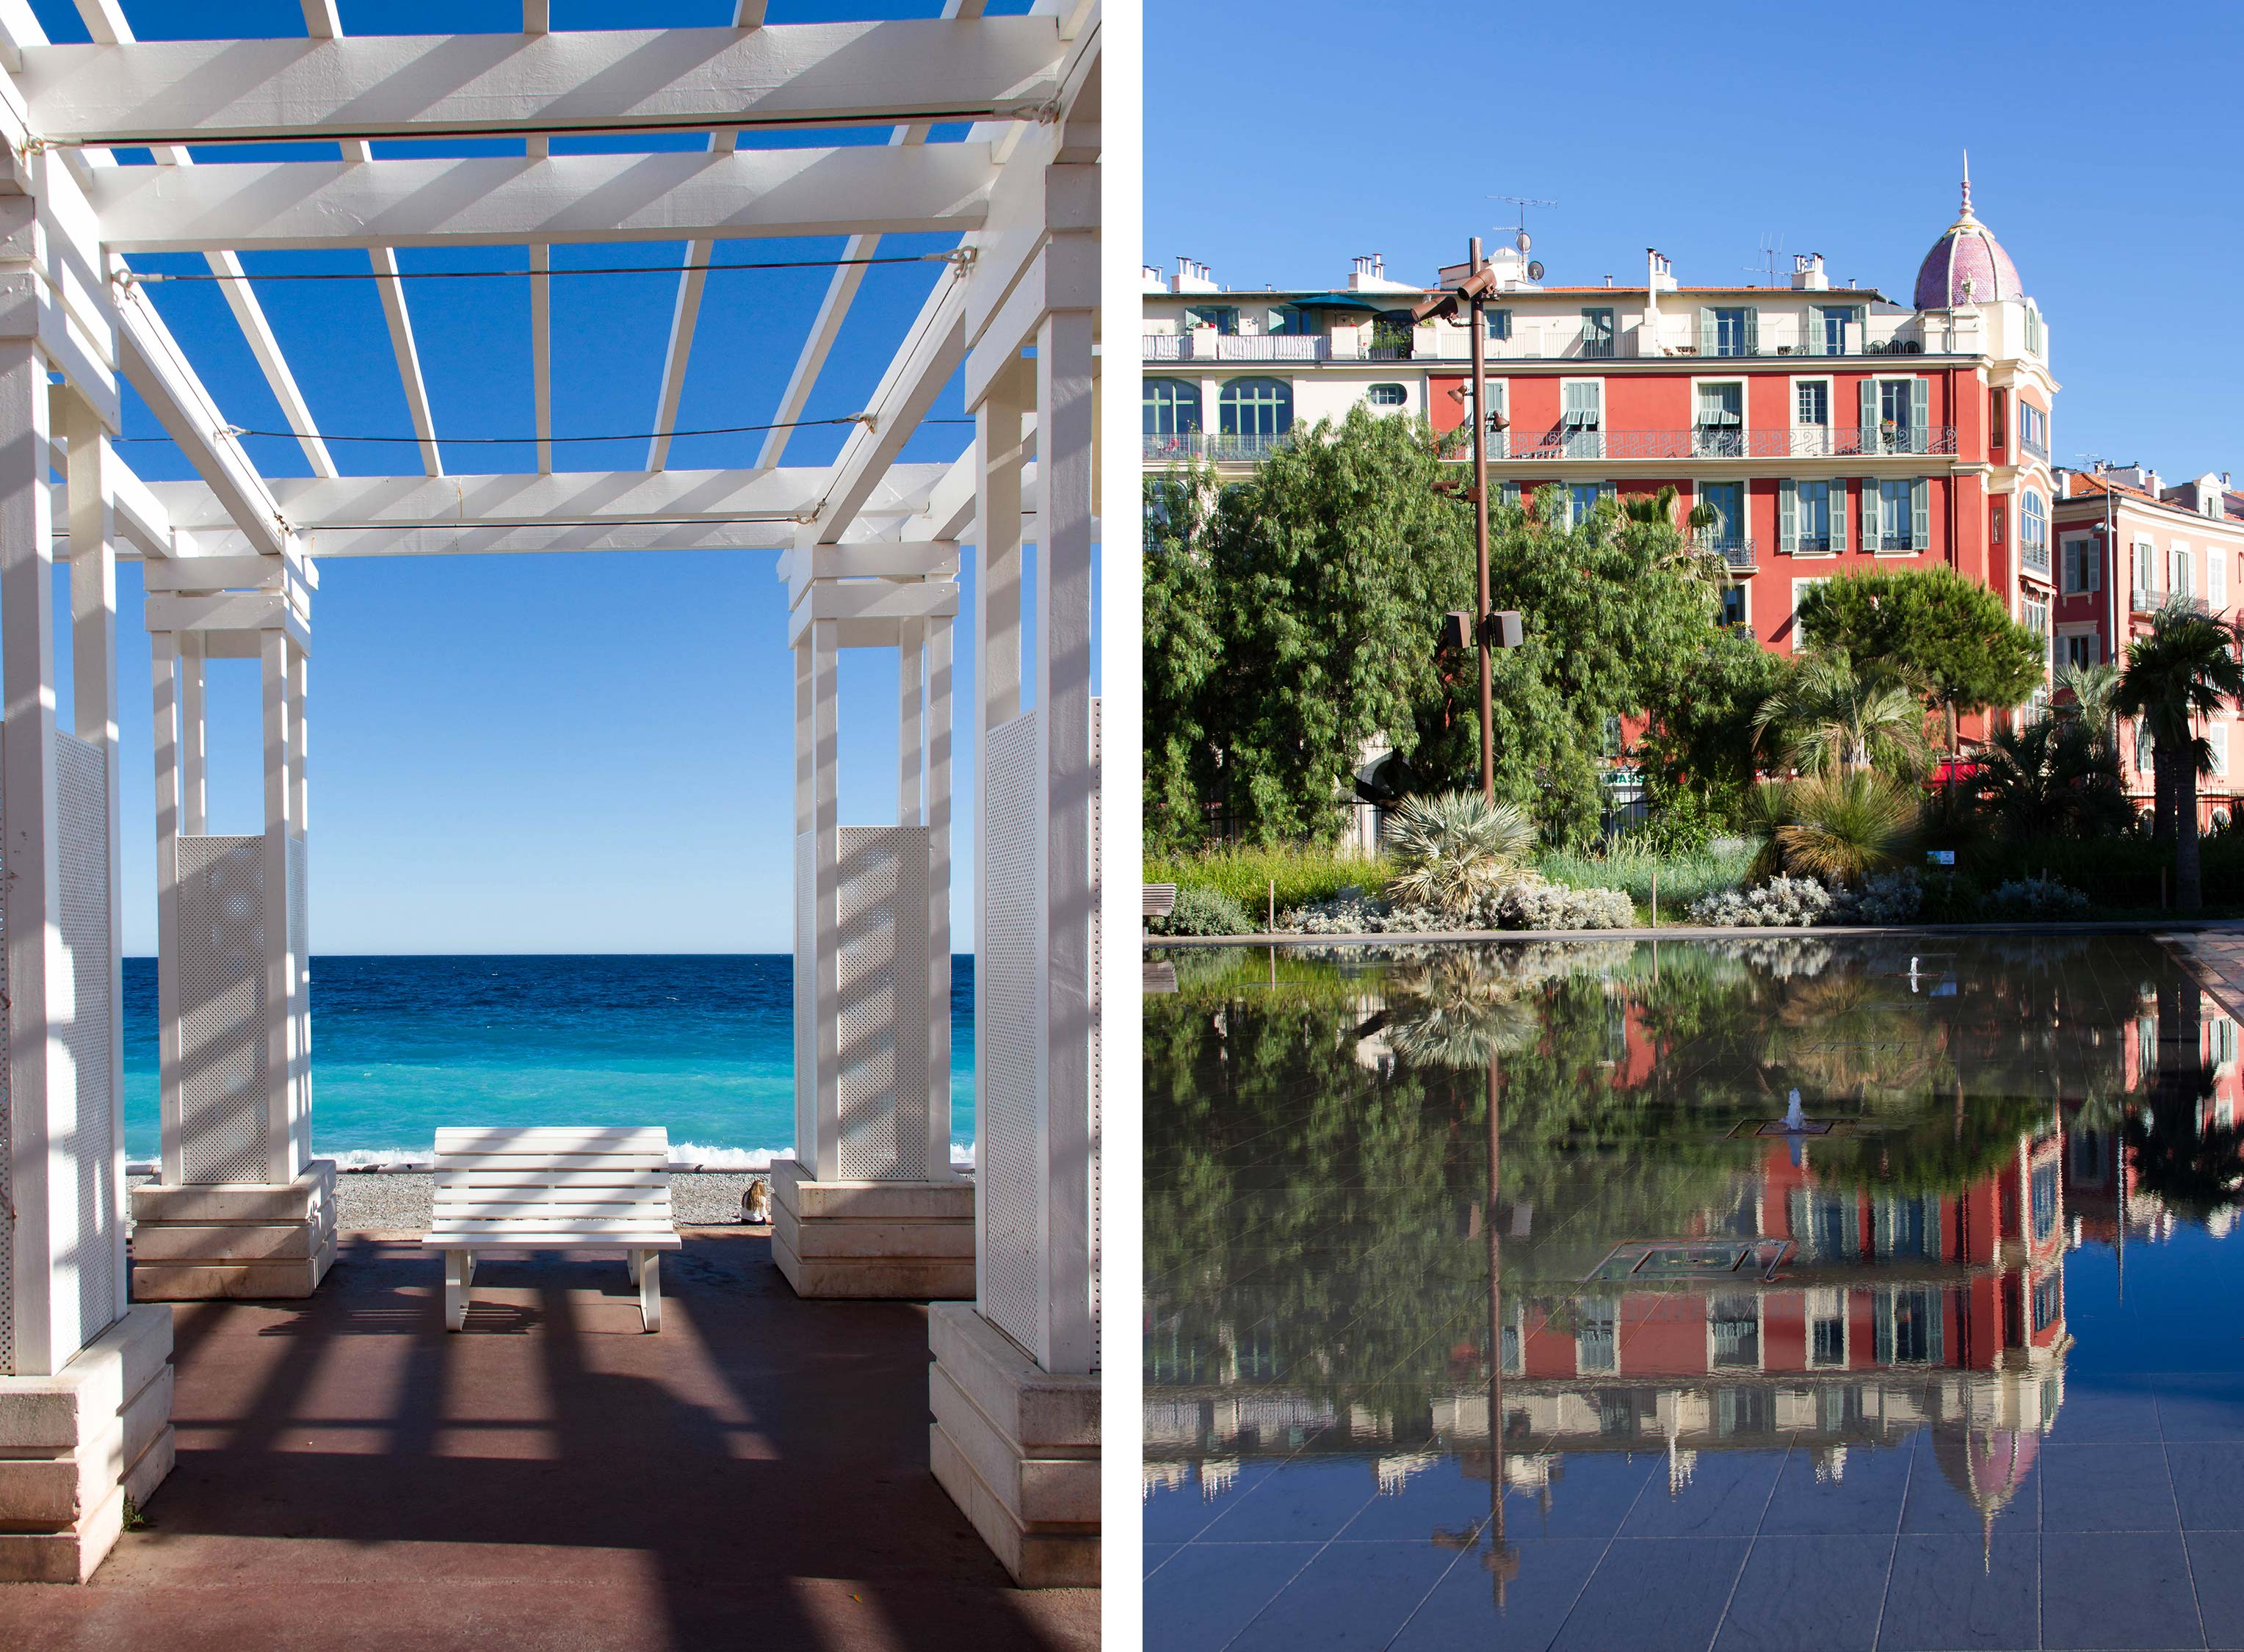 Promenade des Anglais - Promenade du Paillon - Nice